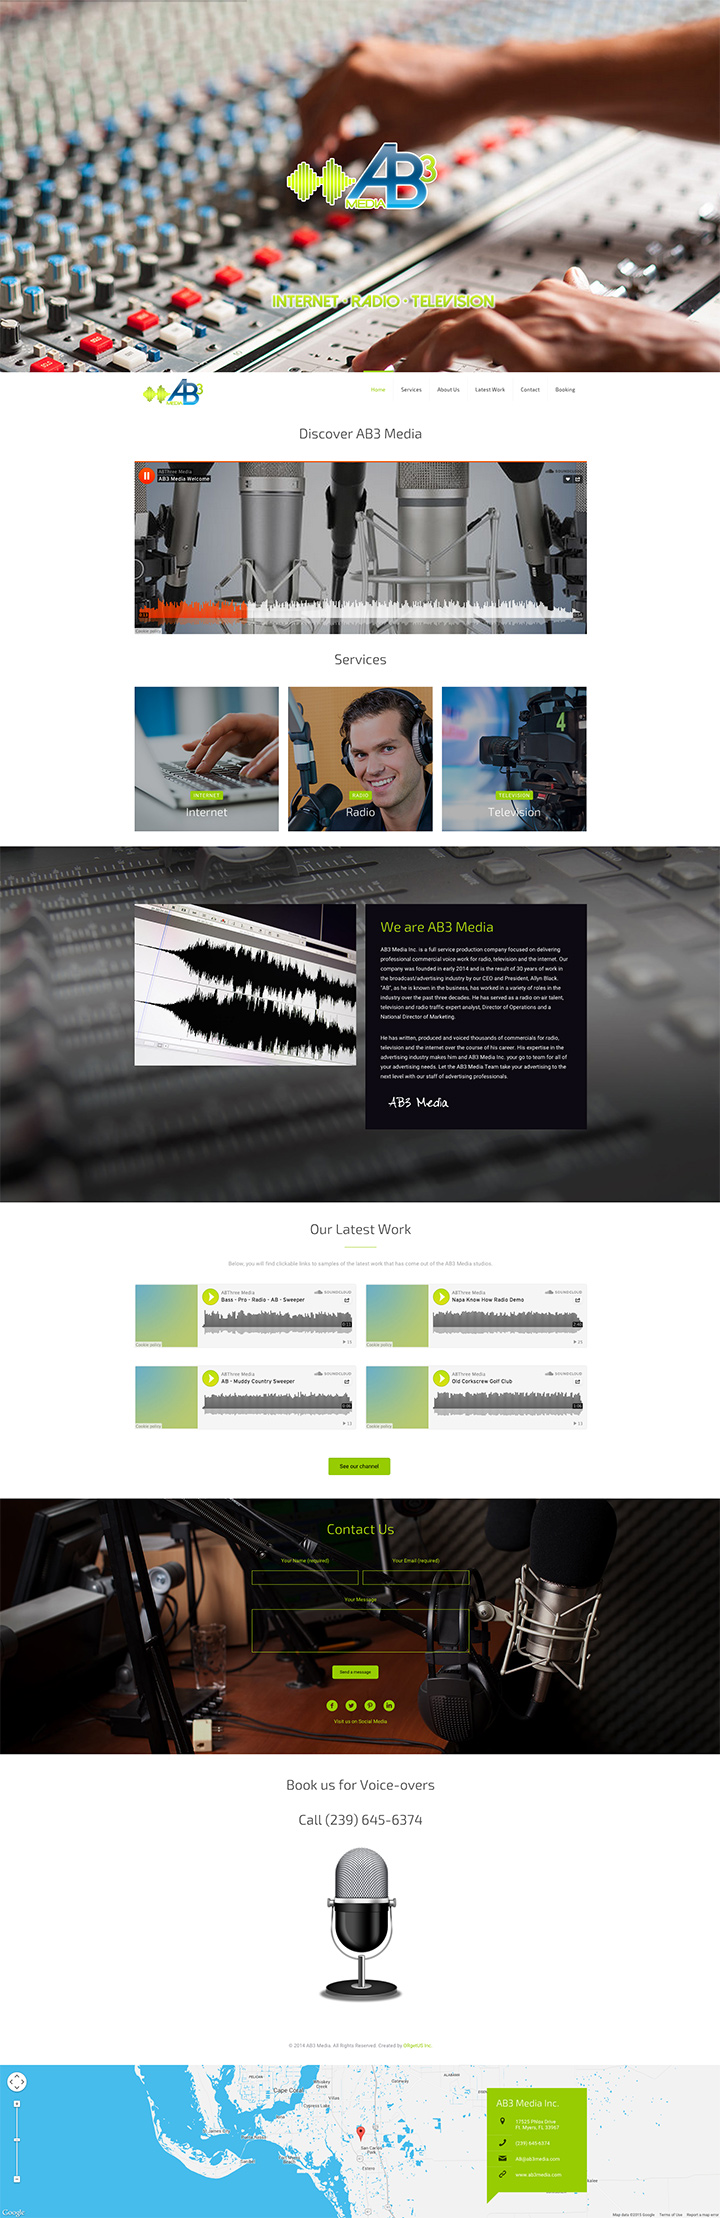 ab3media_website